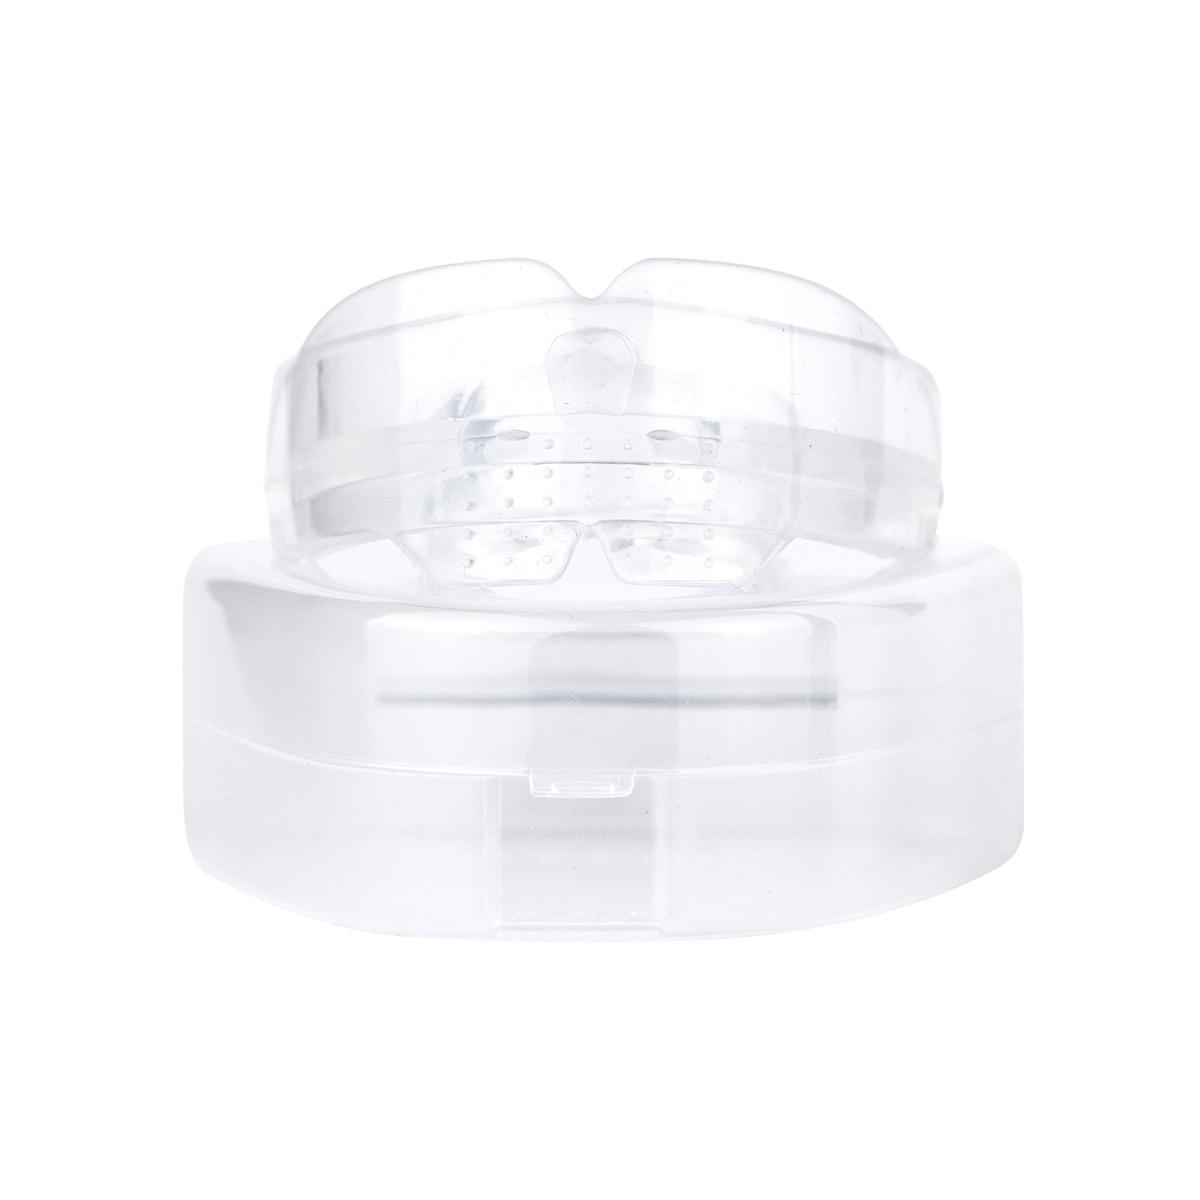 Oraltide-Pro™ Mouthguard